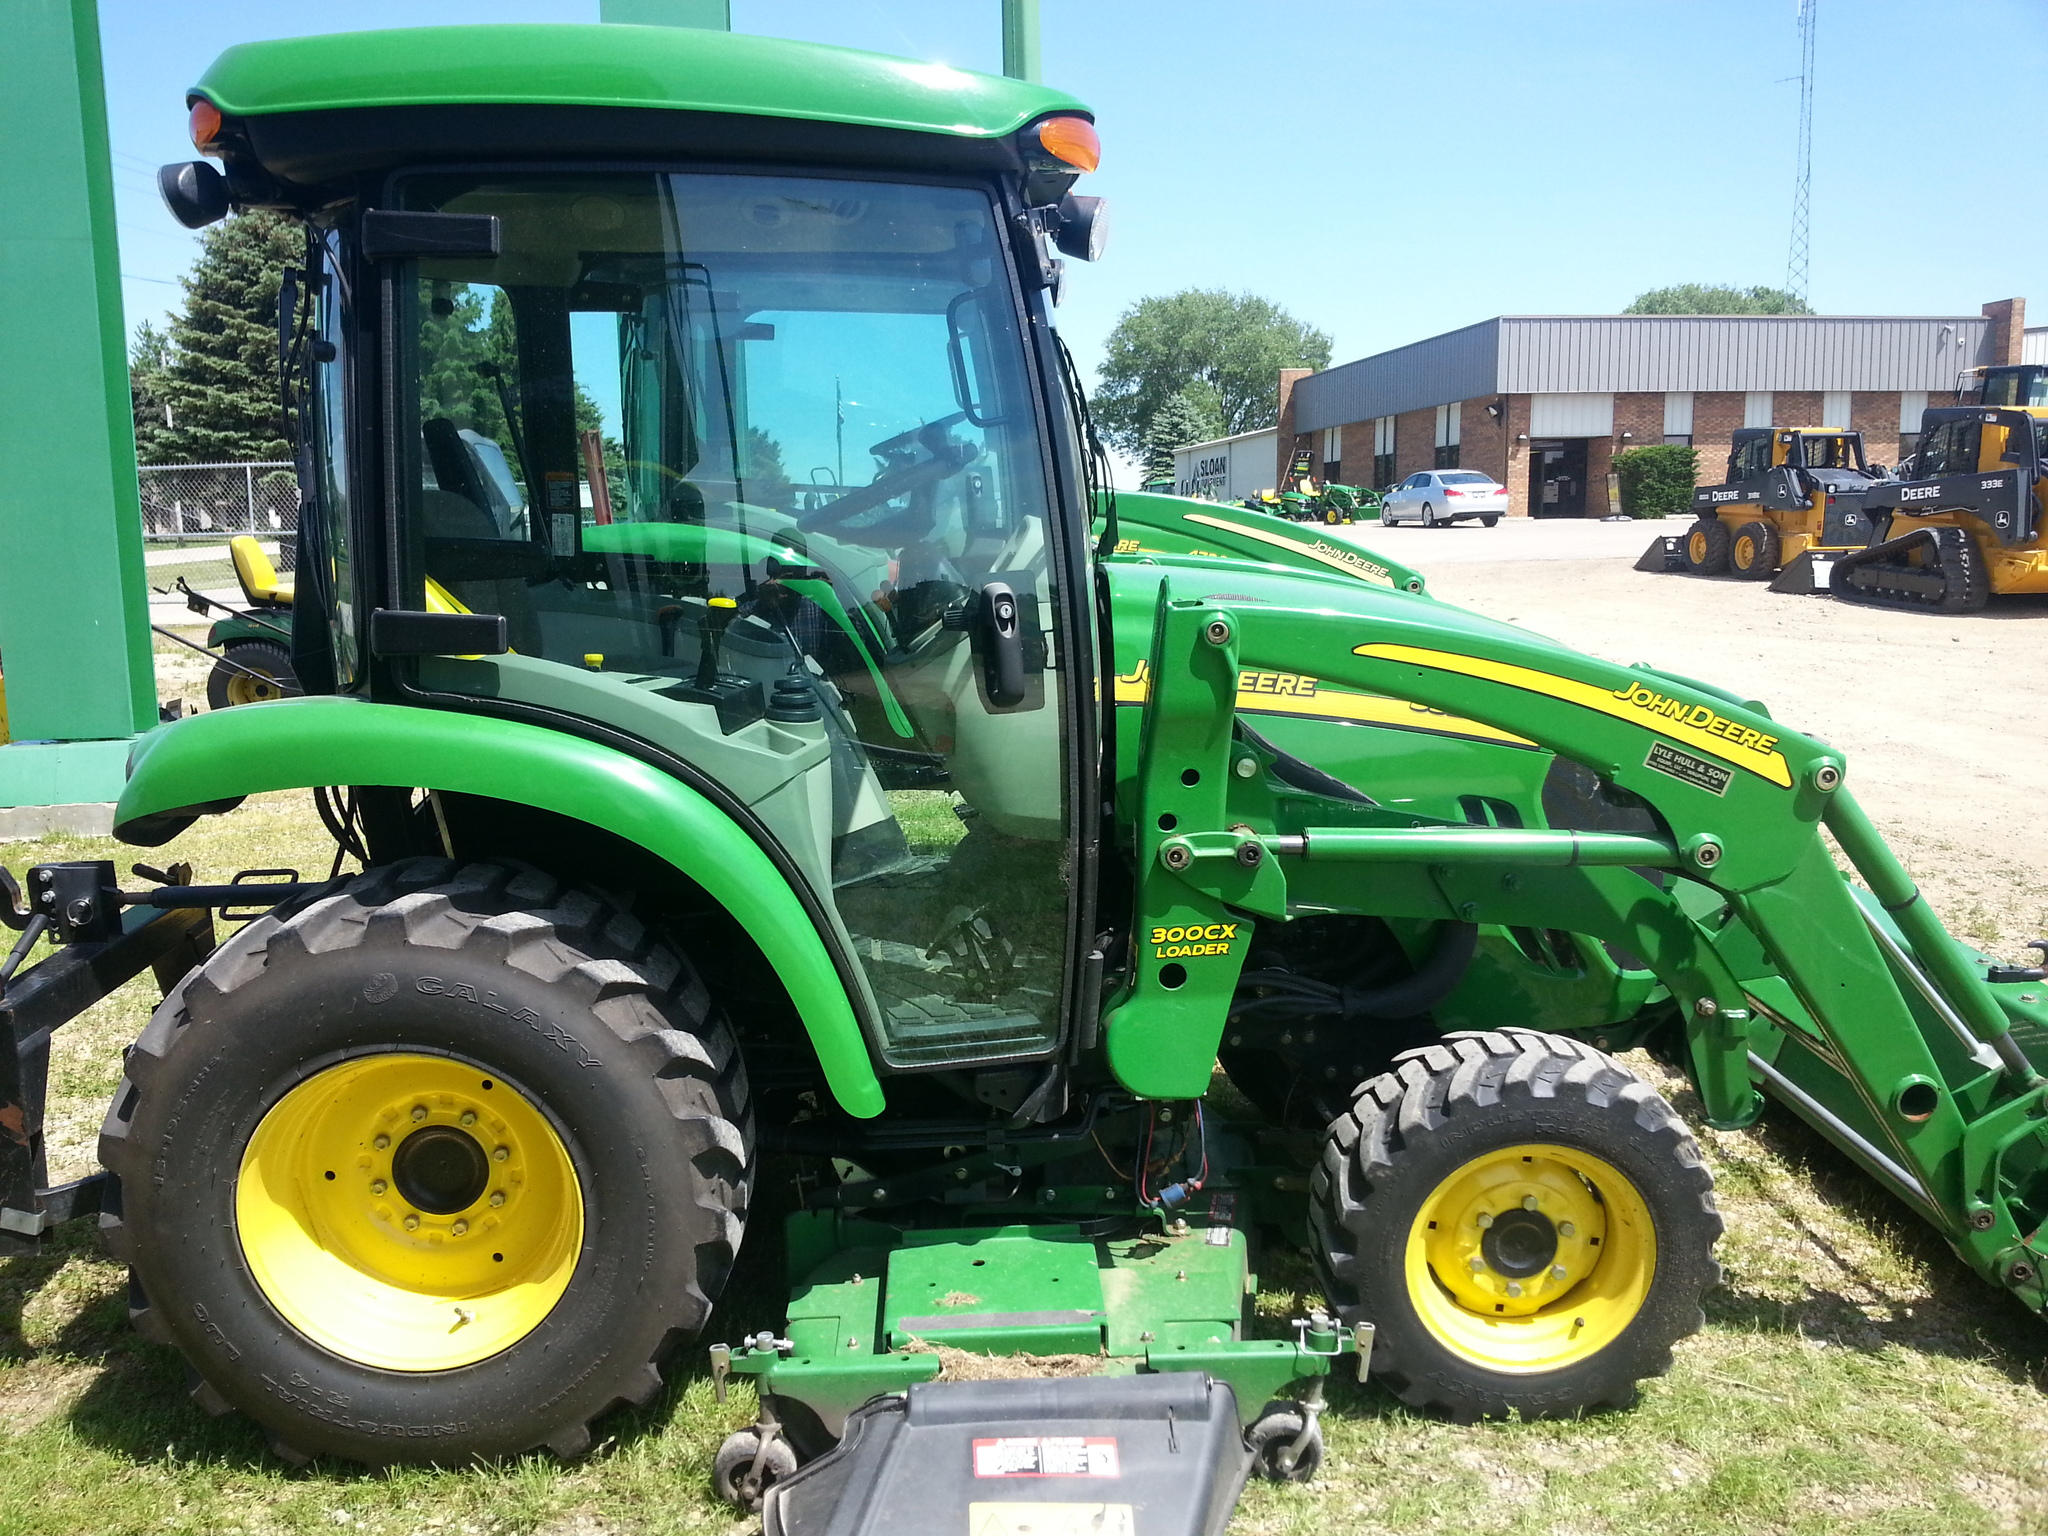 John Deere 3520 Compact Utility Tractors for Sale   [47457]